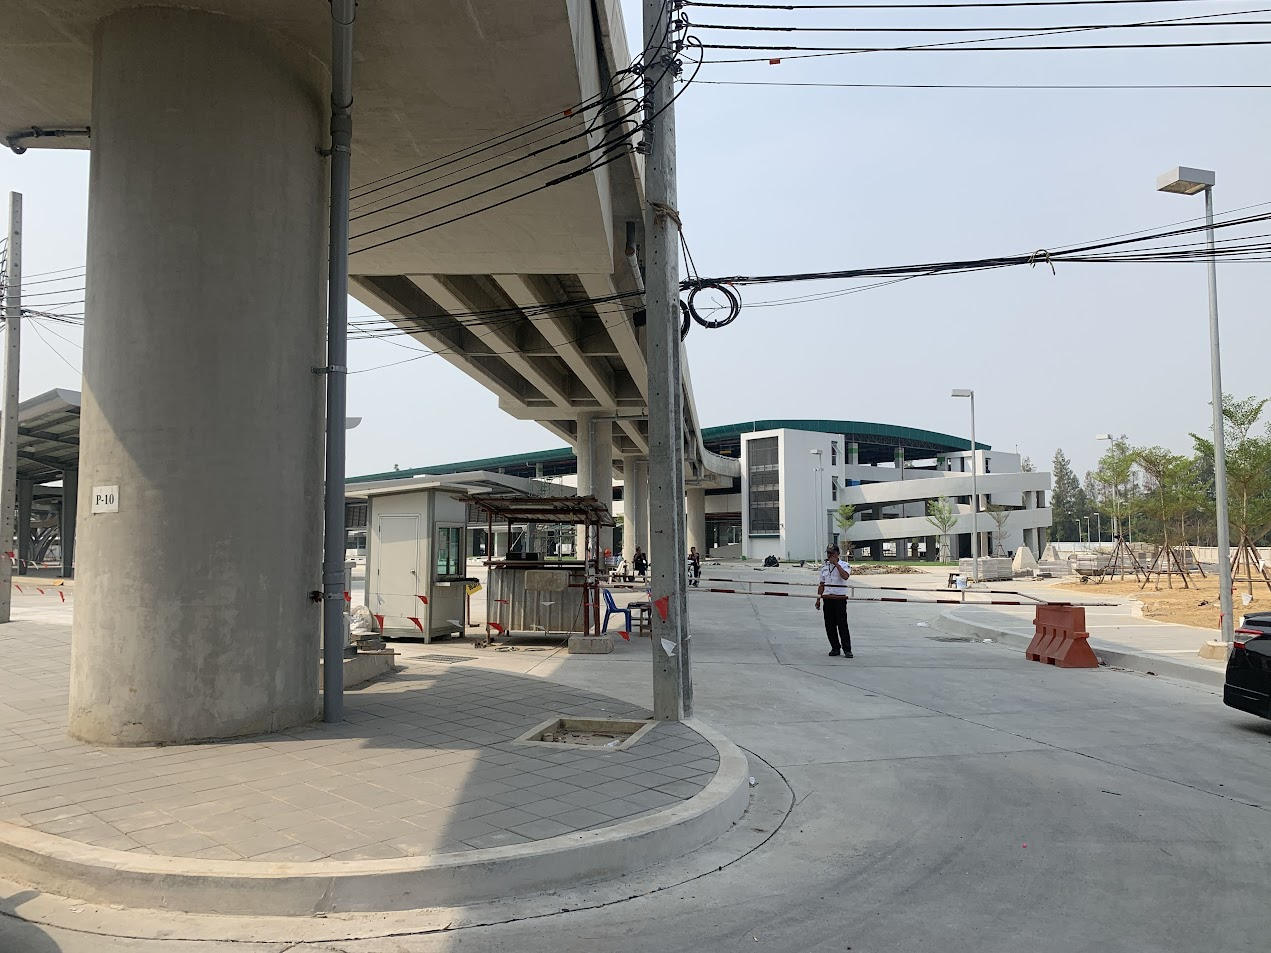 BTS コー・ポー・オー交差点駅にあるパーク・アンド・ライド(駐車場)の様子